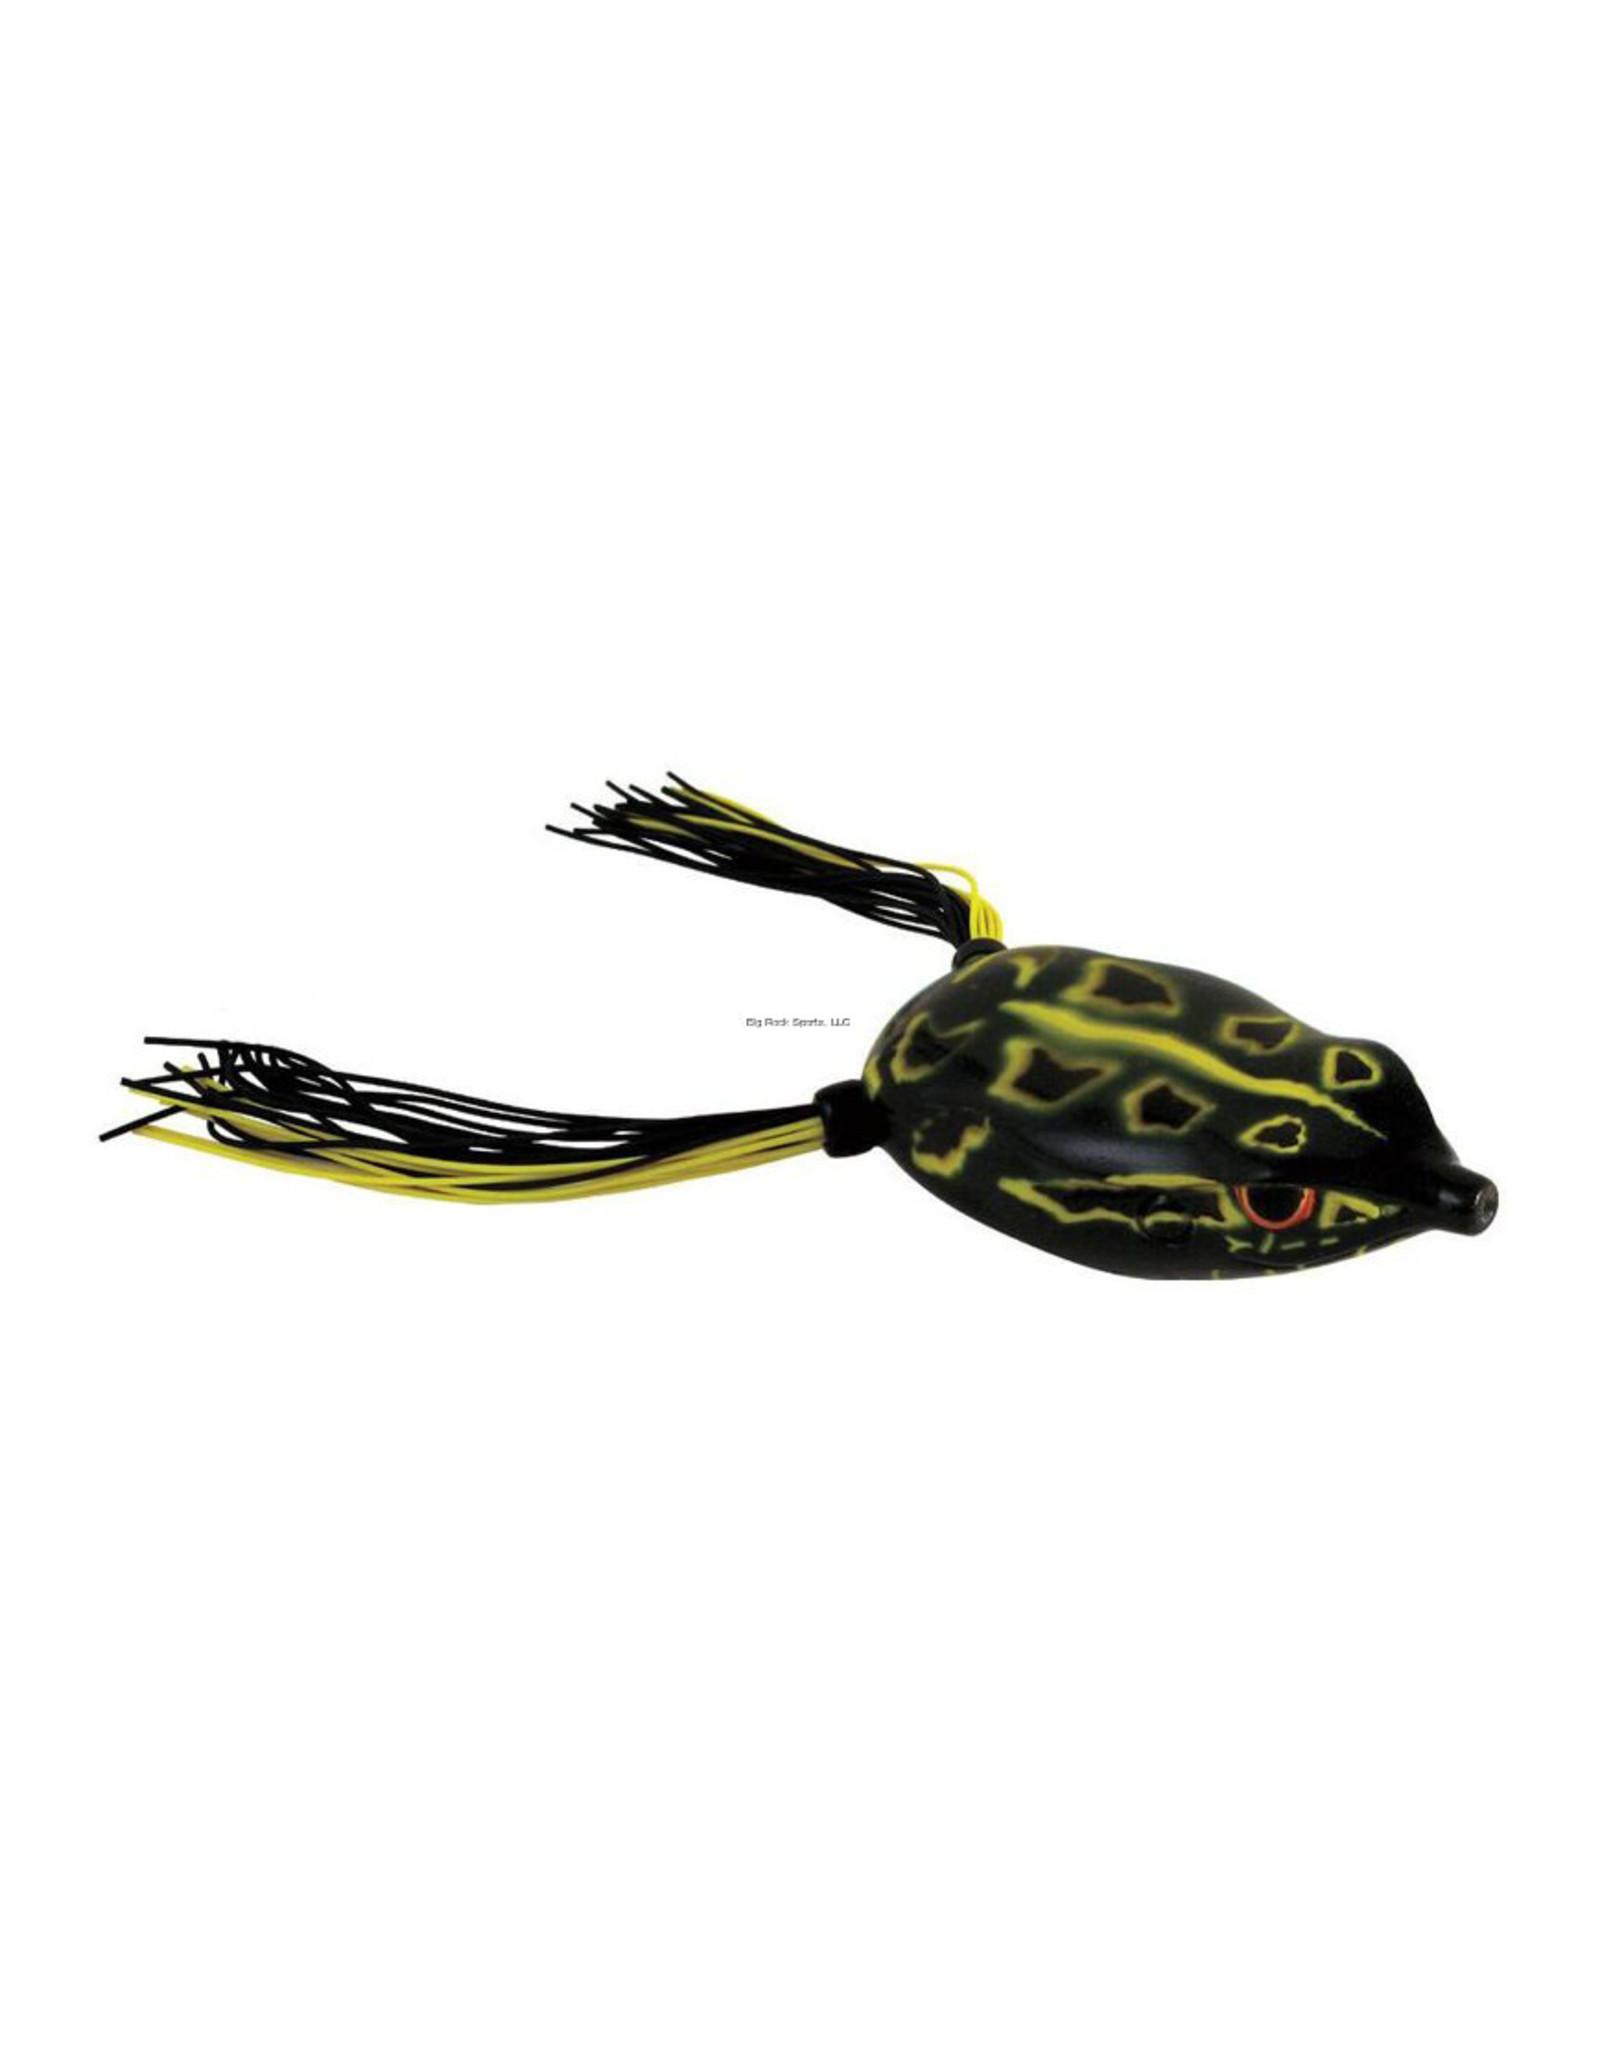 Spro Spro Bronzeye Frog  Jr 60